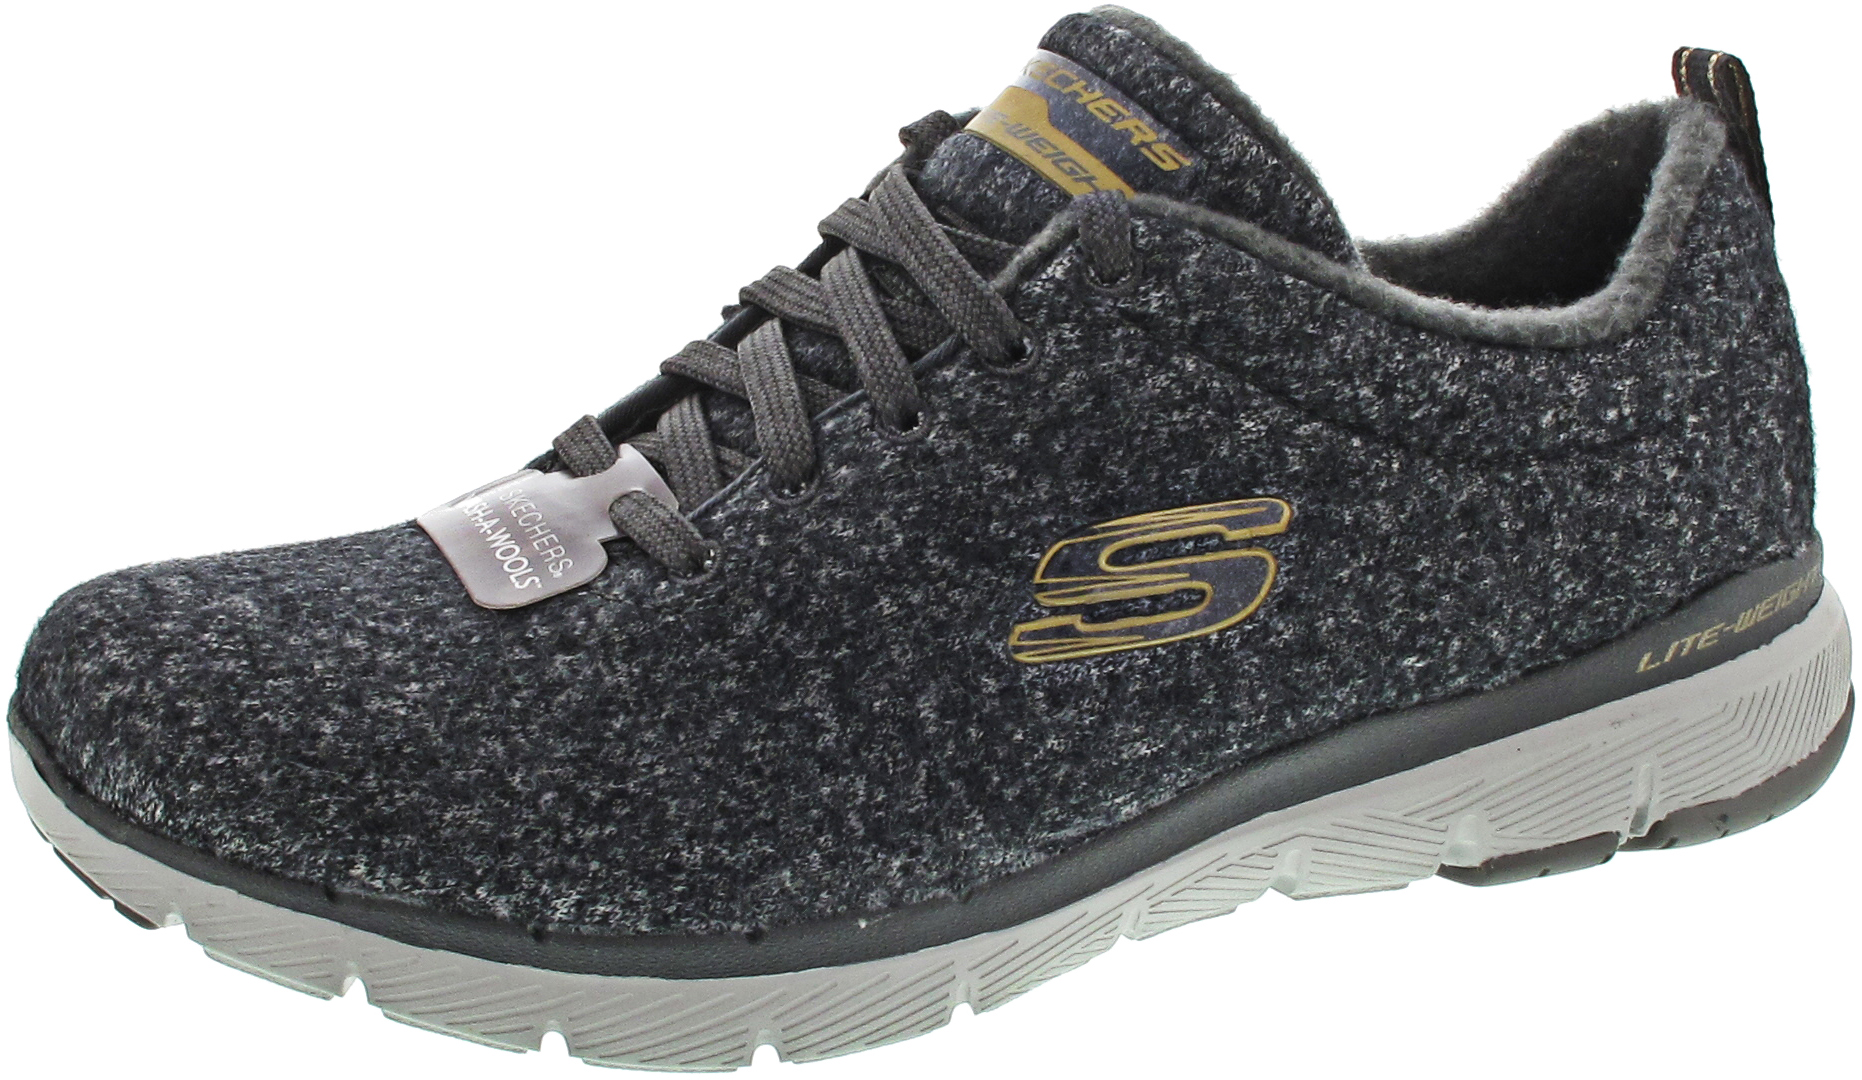 competitive price b429f b994e Skechers, hochflexibler Laufgenuss mit Memory Foam, für ...